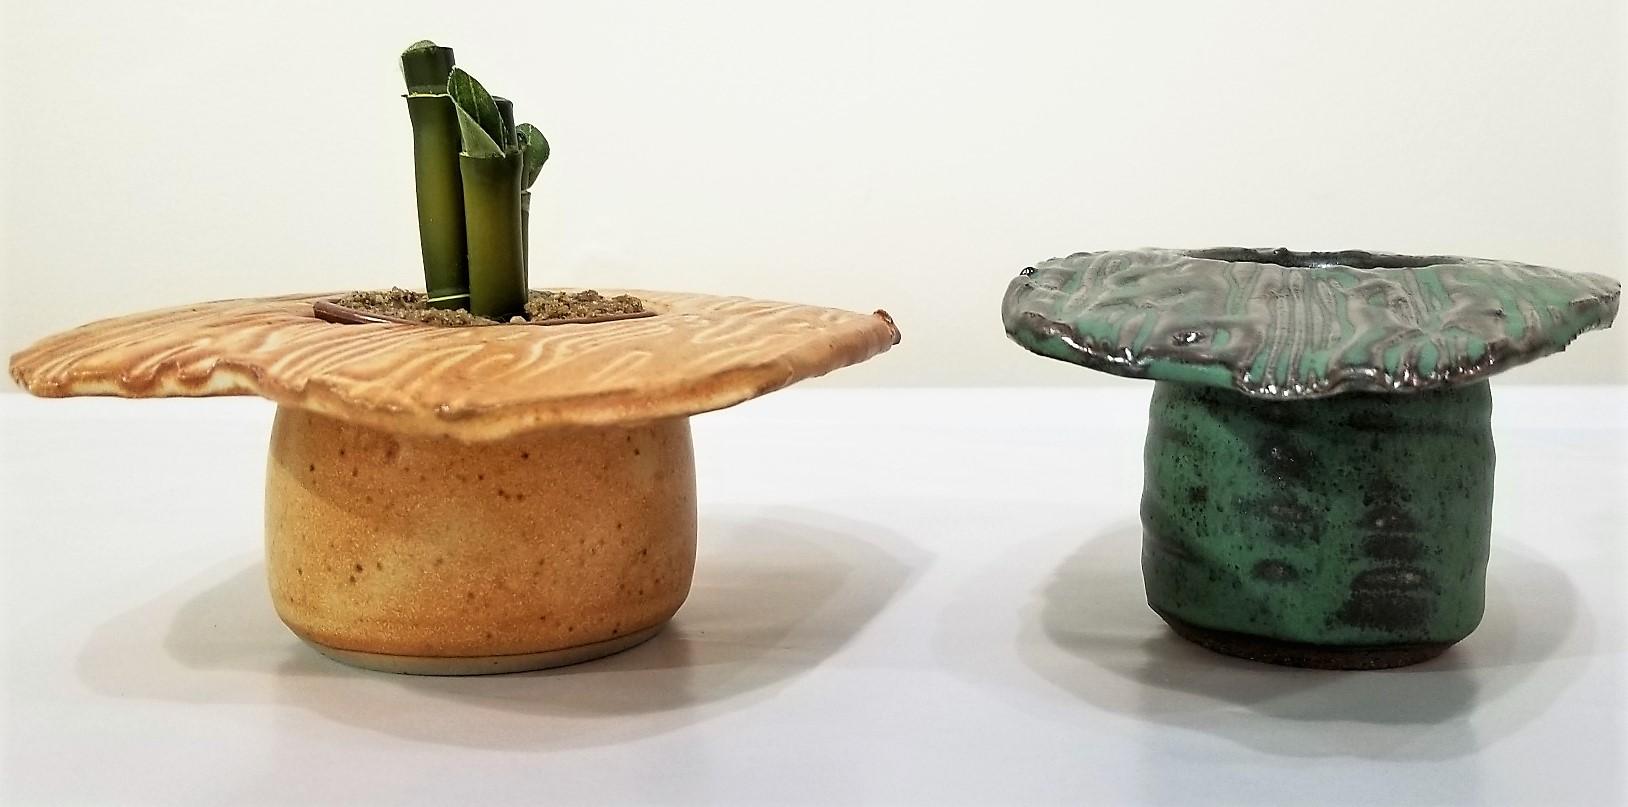 Handmade Ceramic Ikebana Planters by Ken Barnes